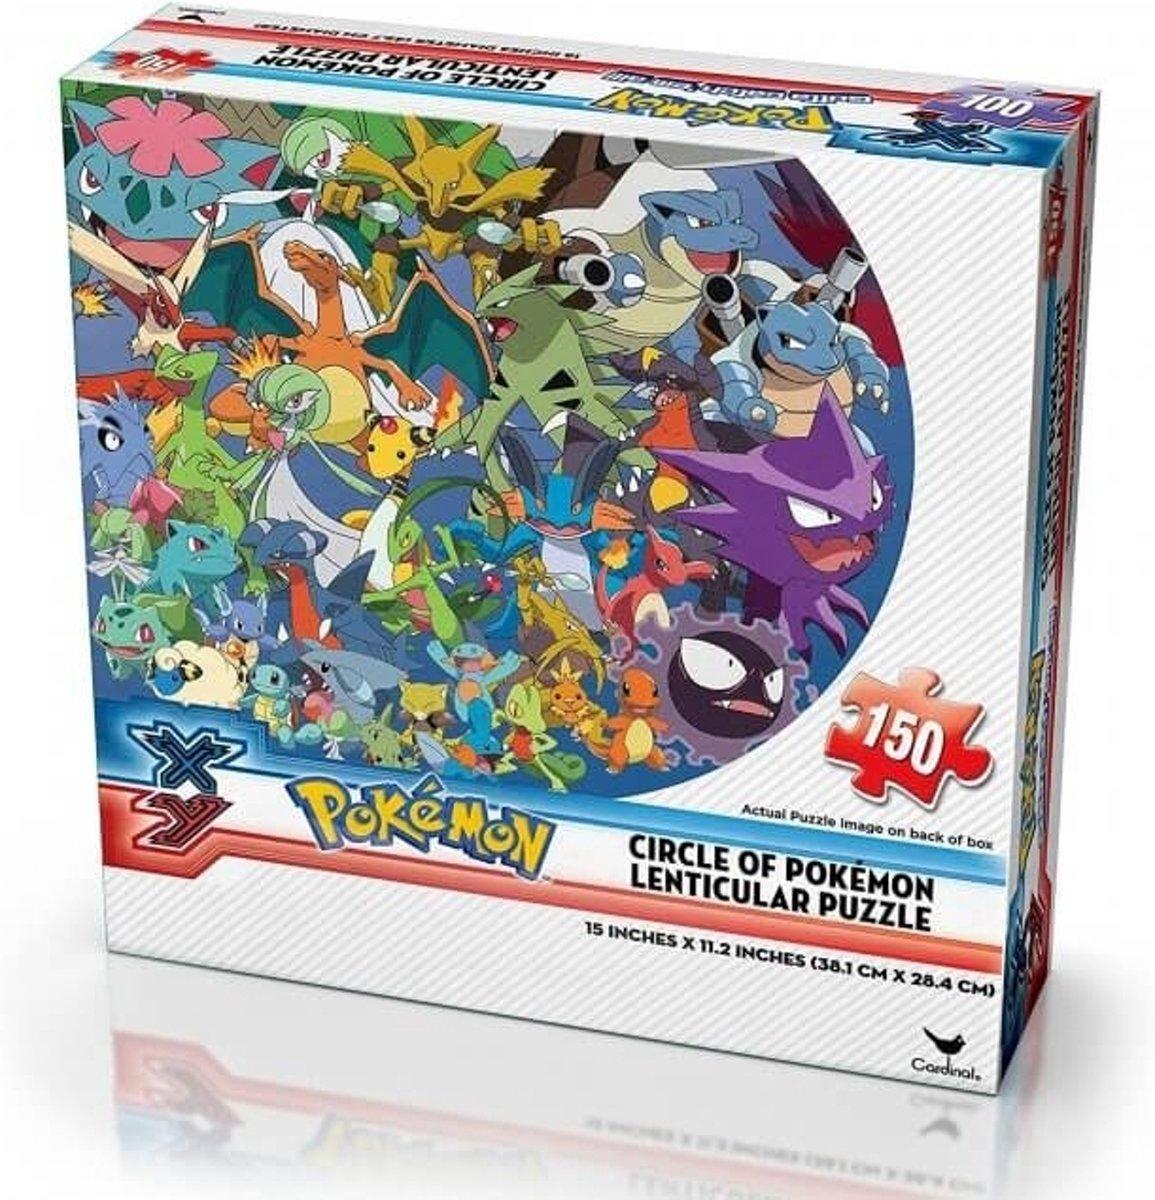 Pokemon X&Y Lenticular Puzzle - Circle of Pokemon